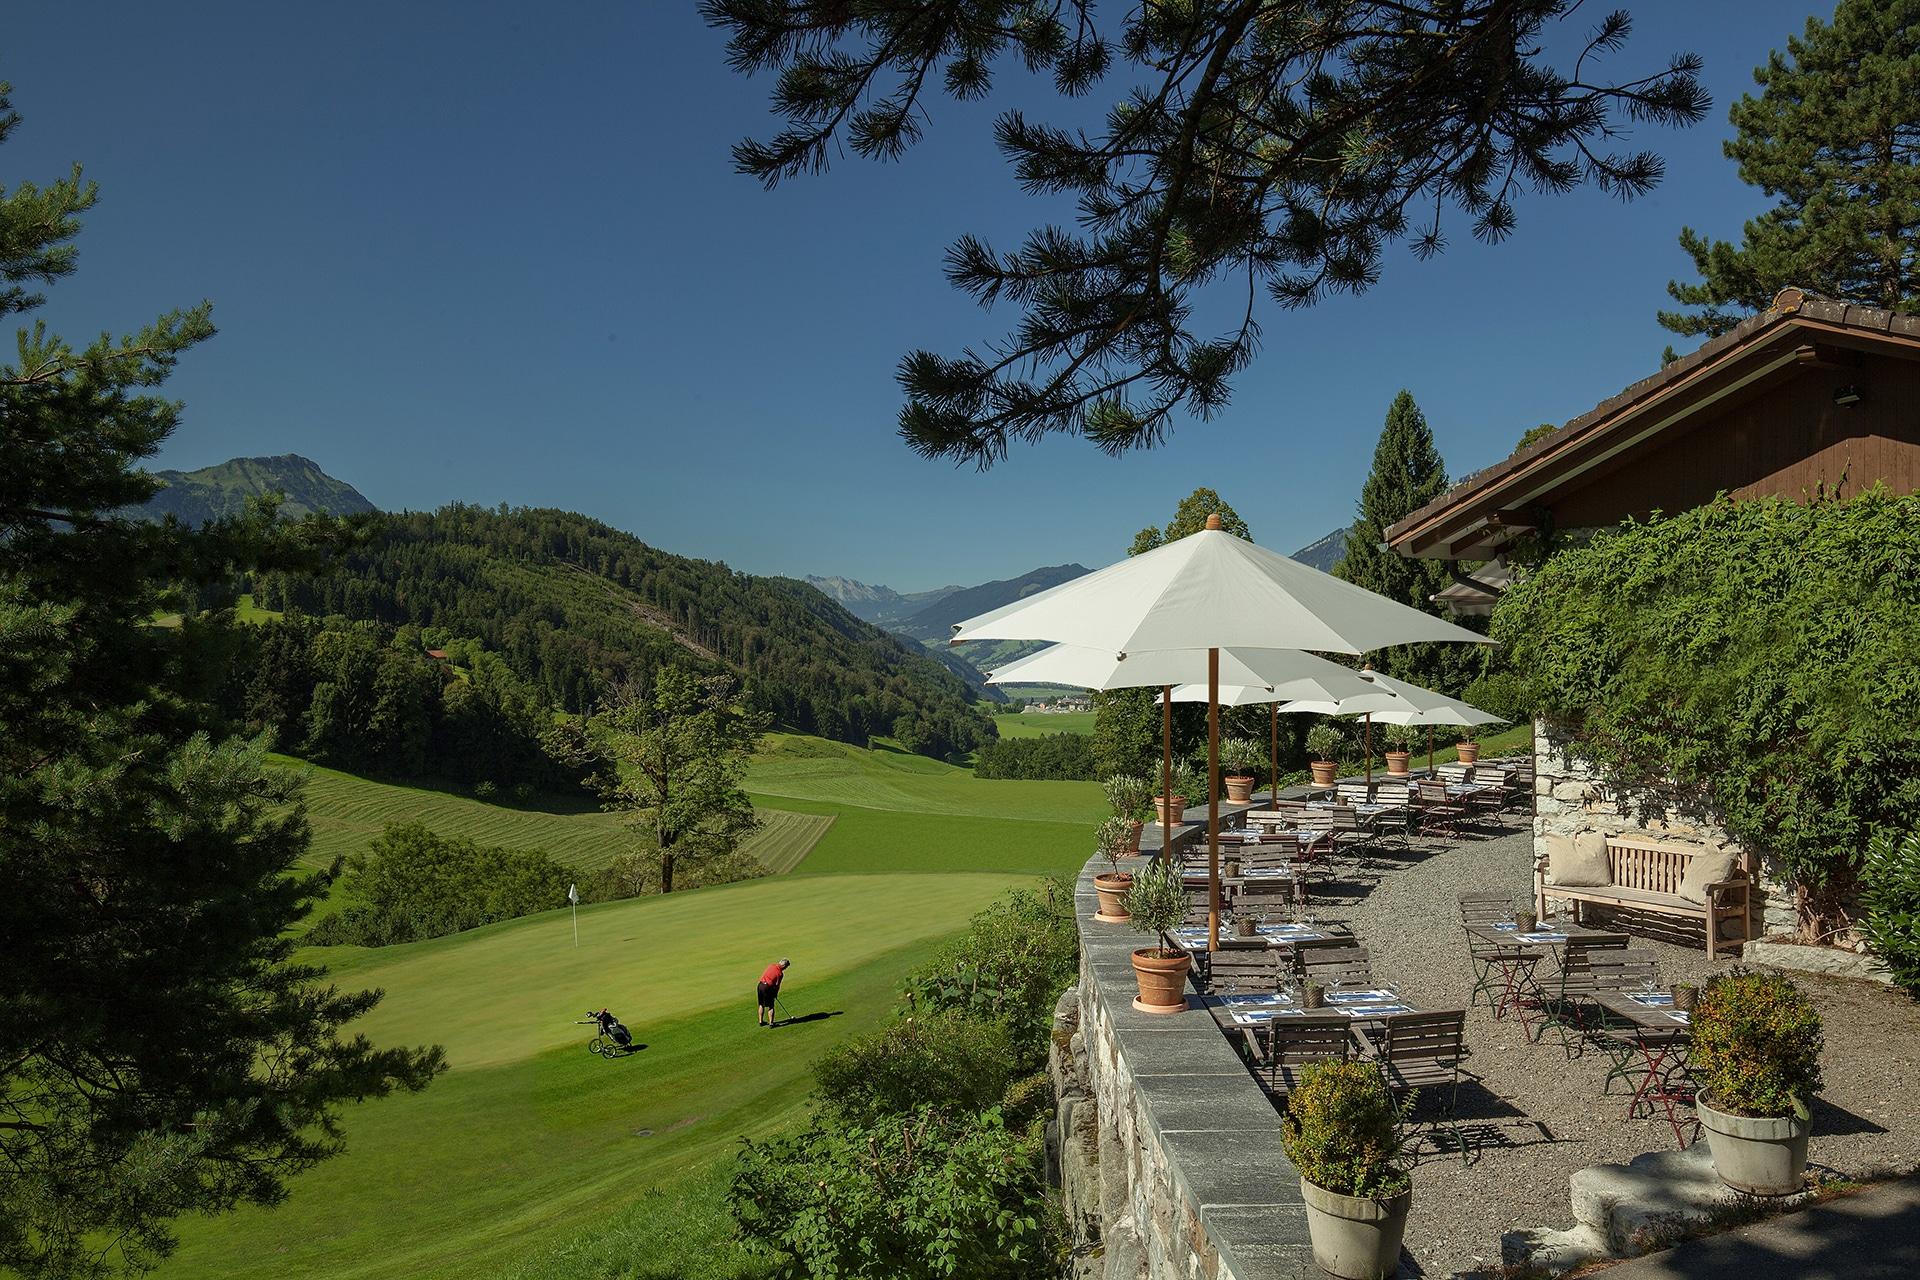 Carrousel -Burgenstock alpine_golf_restaurant_exterior_terrace_2